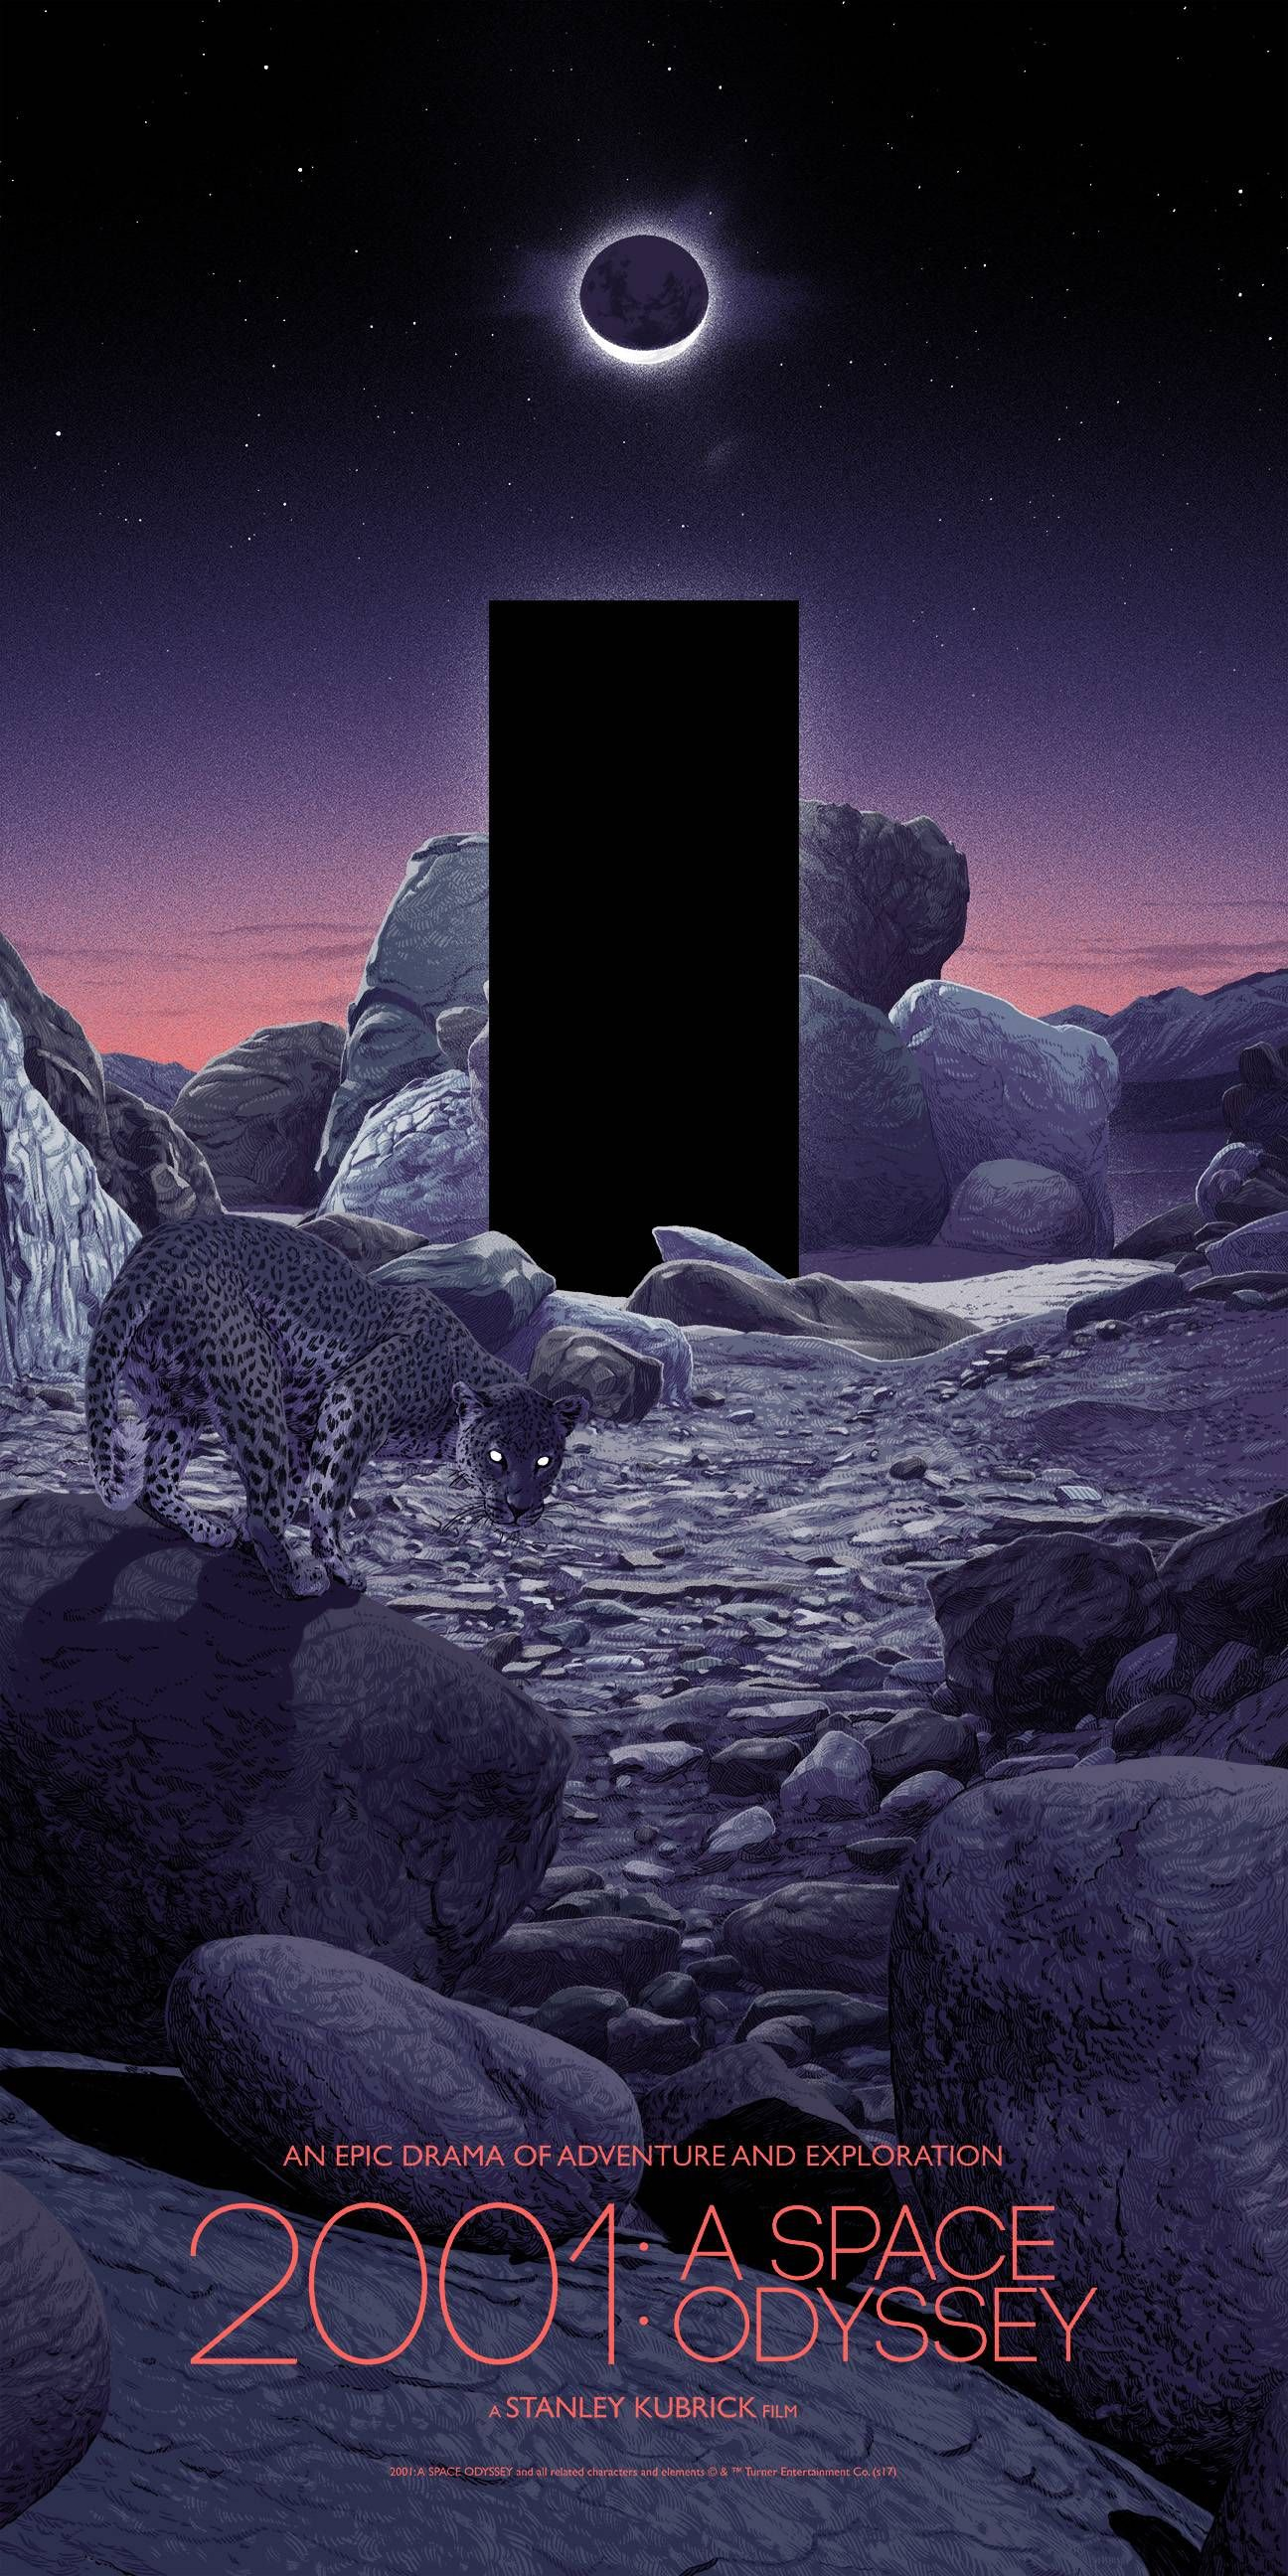 2001 A Space Odyssey Affiche Film Affiche Cinema Affiche De Film